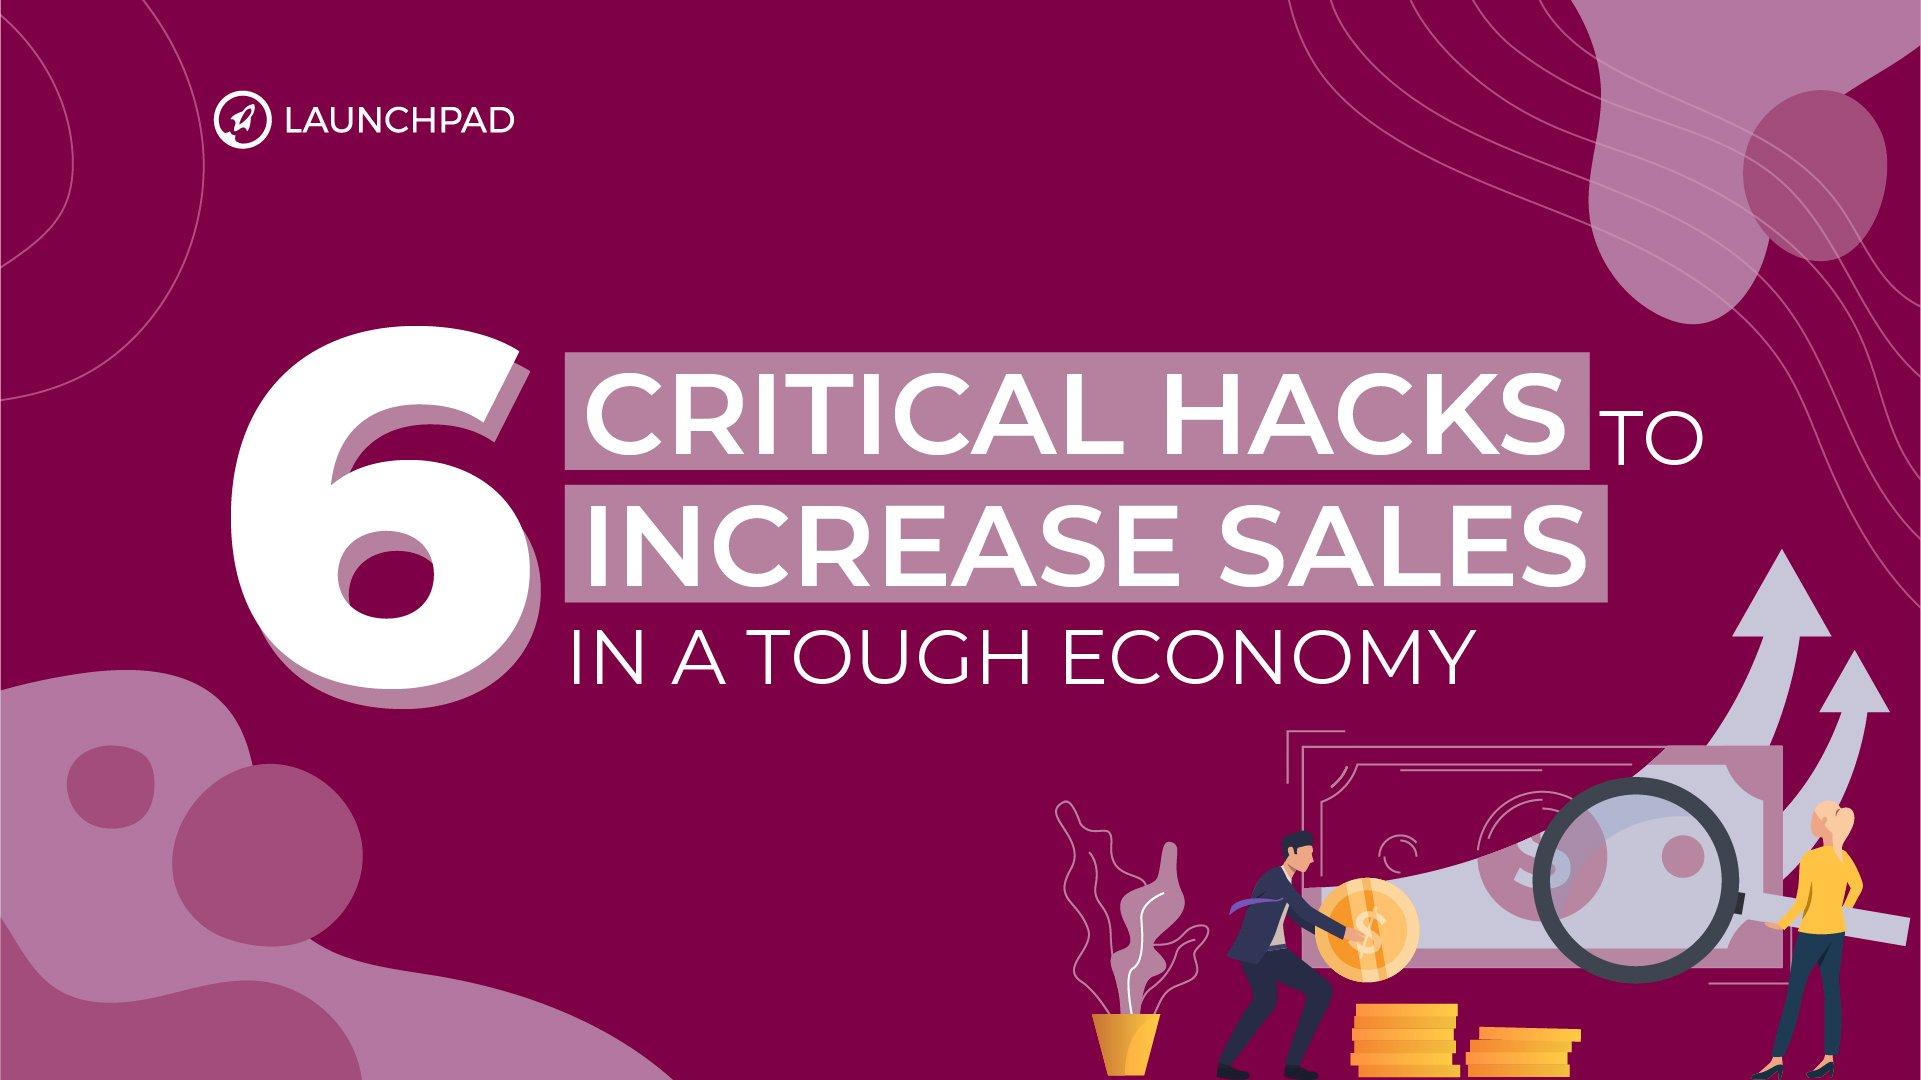 Blog[SM]-6 Critical Hacks to Increase Sales in a Tough Economy-02